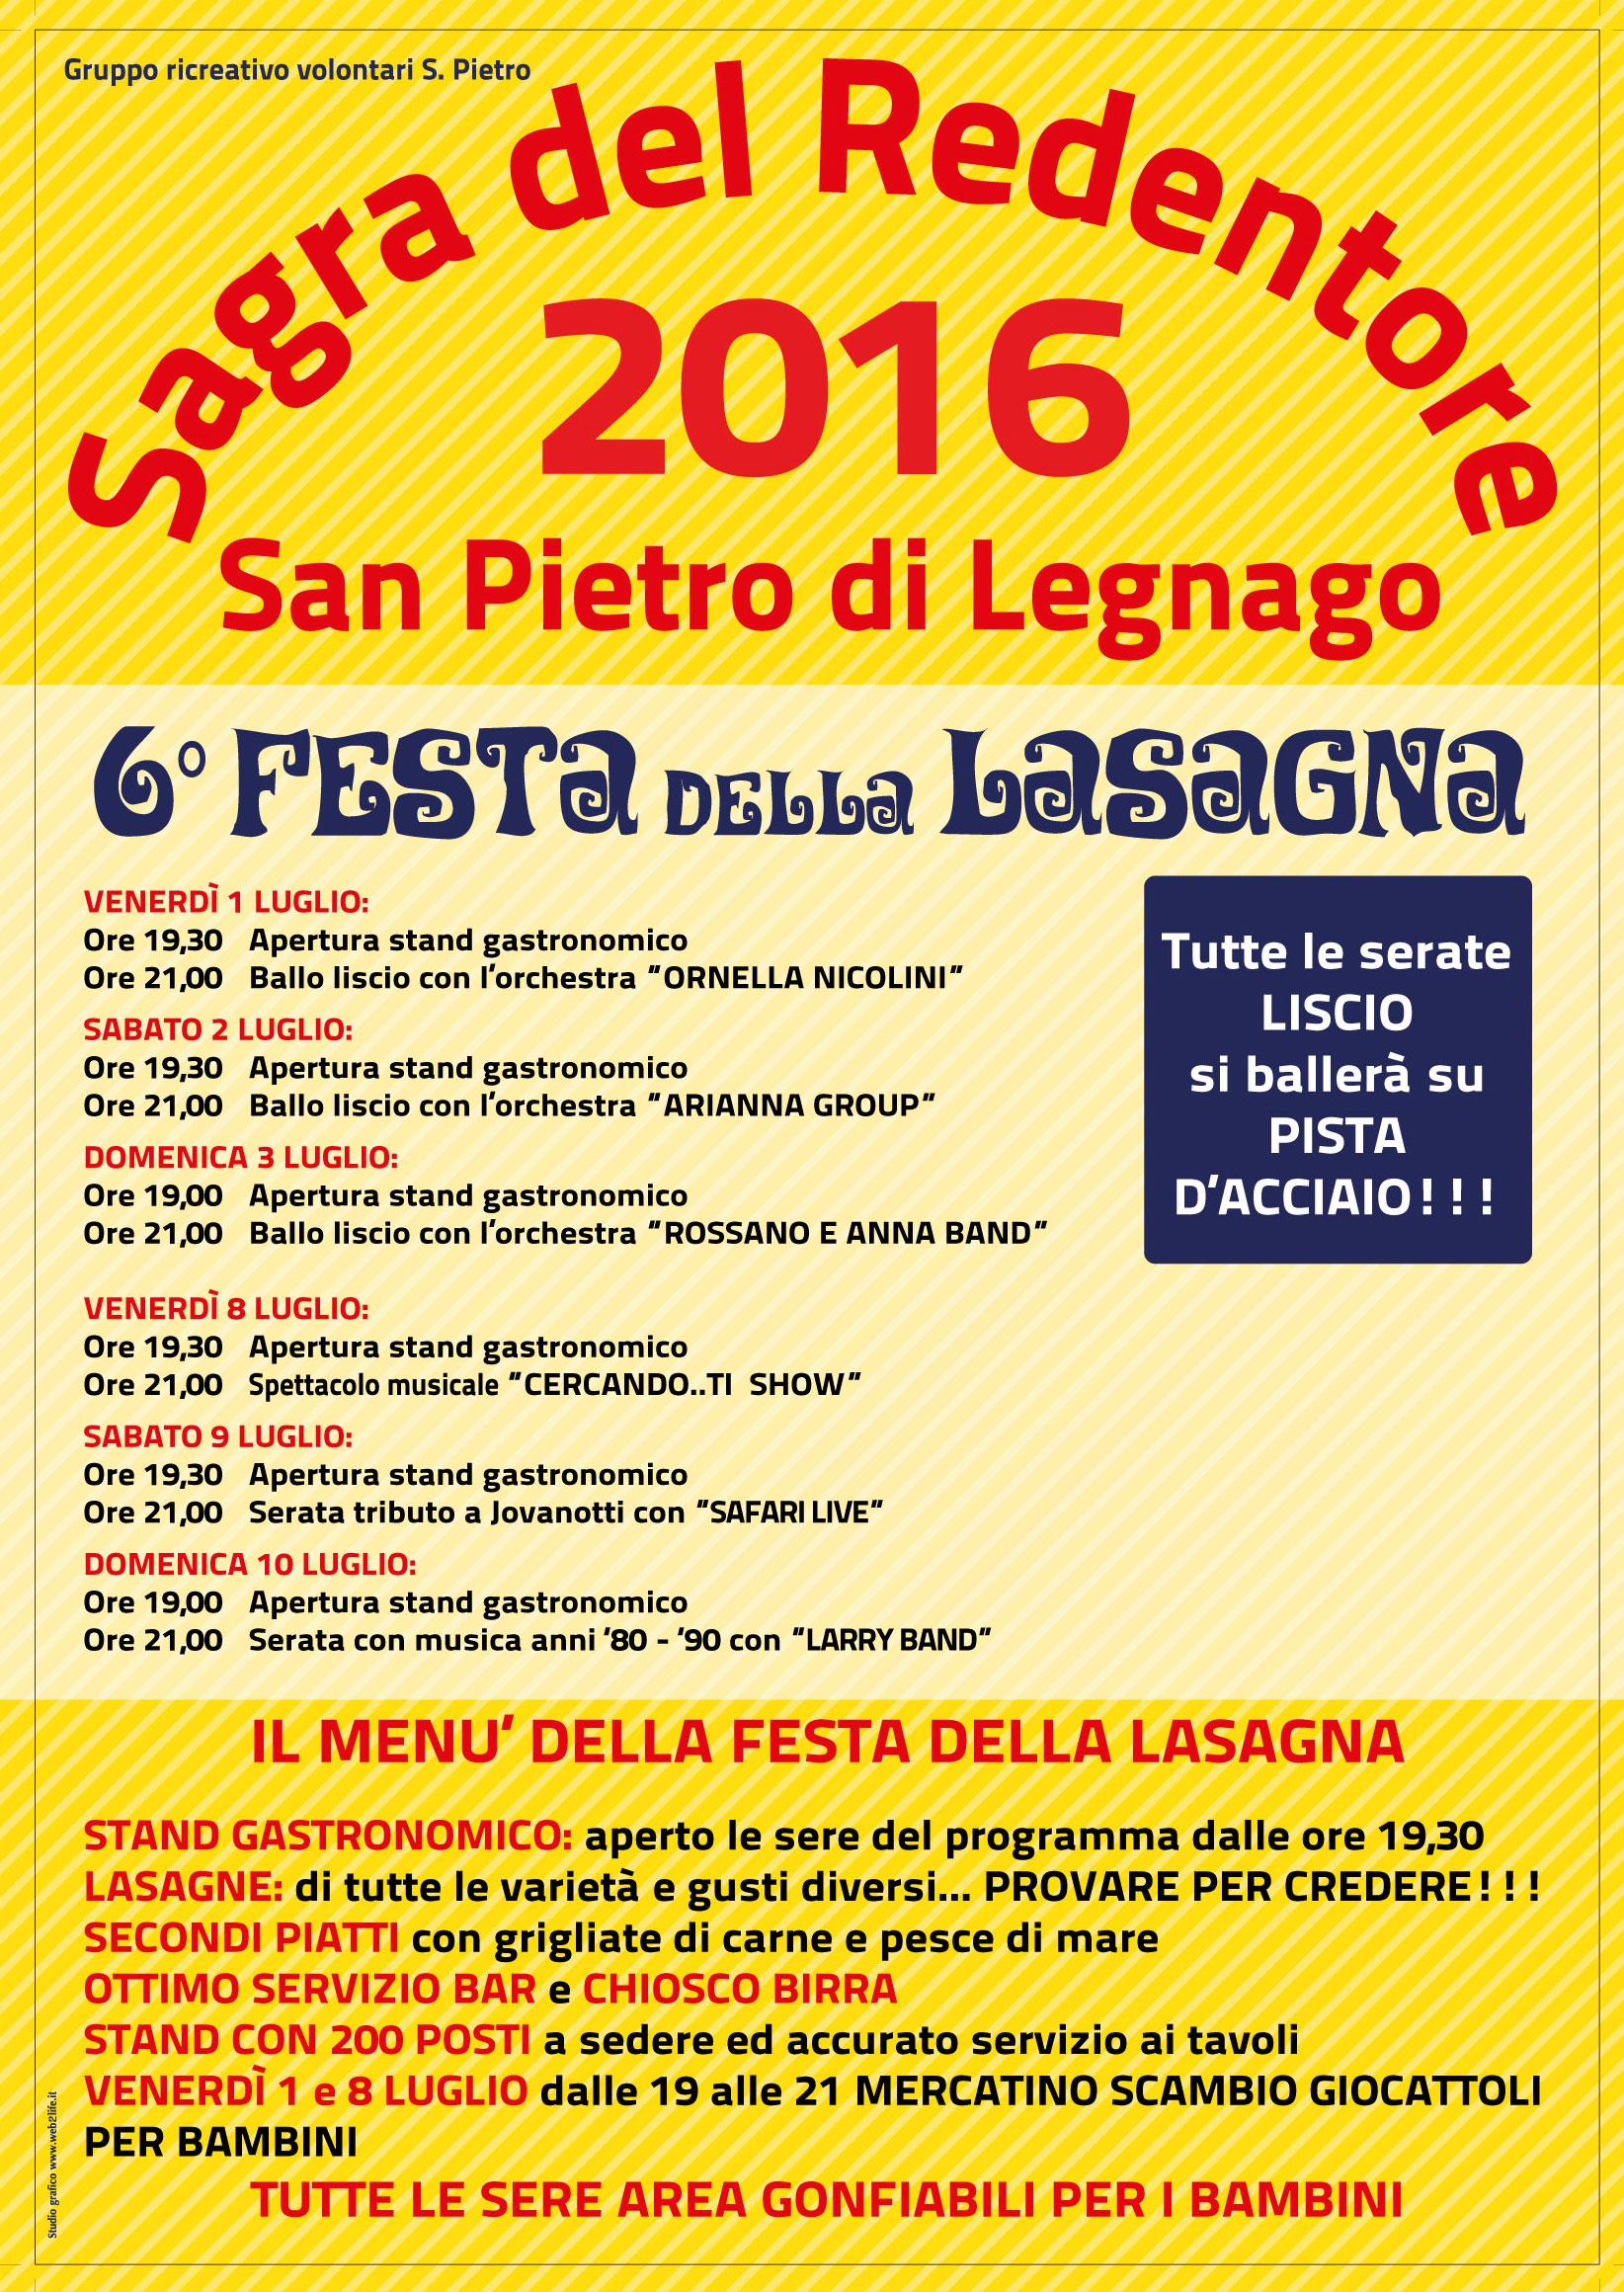 San Pietro Di Legnago Verona festa della lasagna - sagra del redentore 2016 - parrocchia